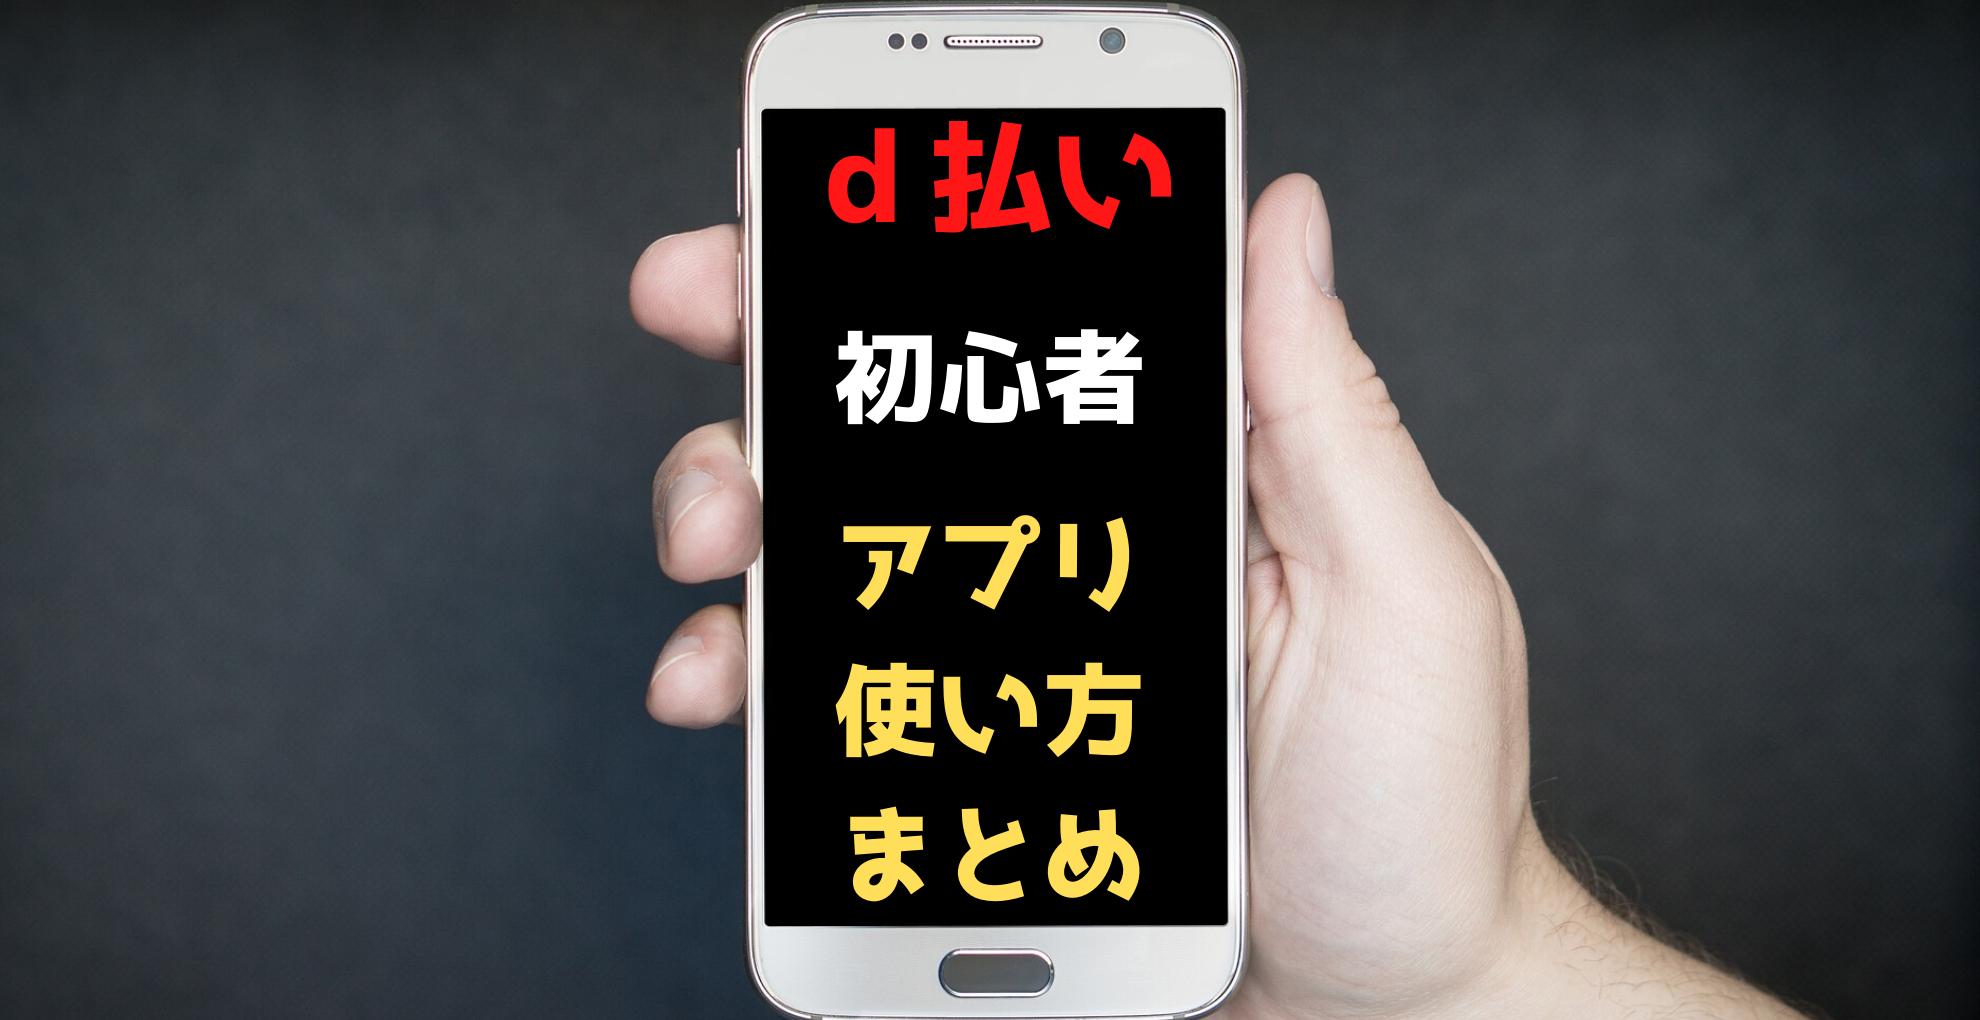 【d払い】未経験者&初心者向け アプリの基本 使い方まとめ